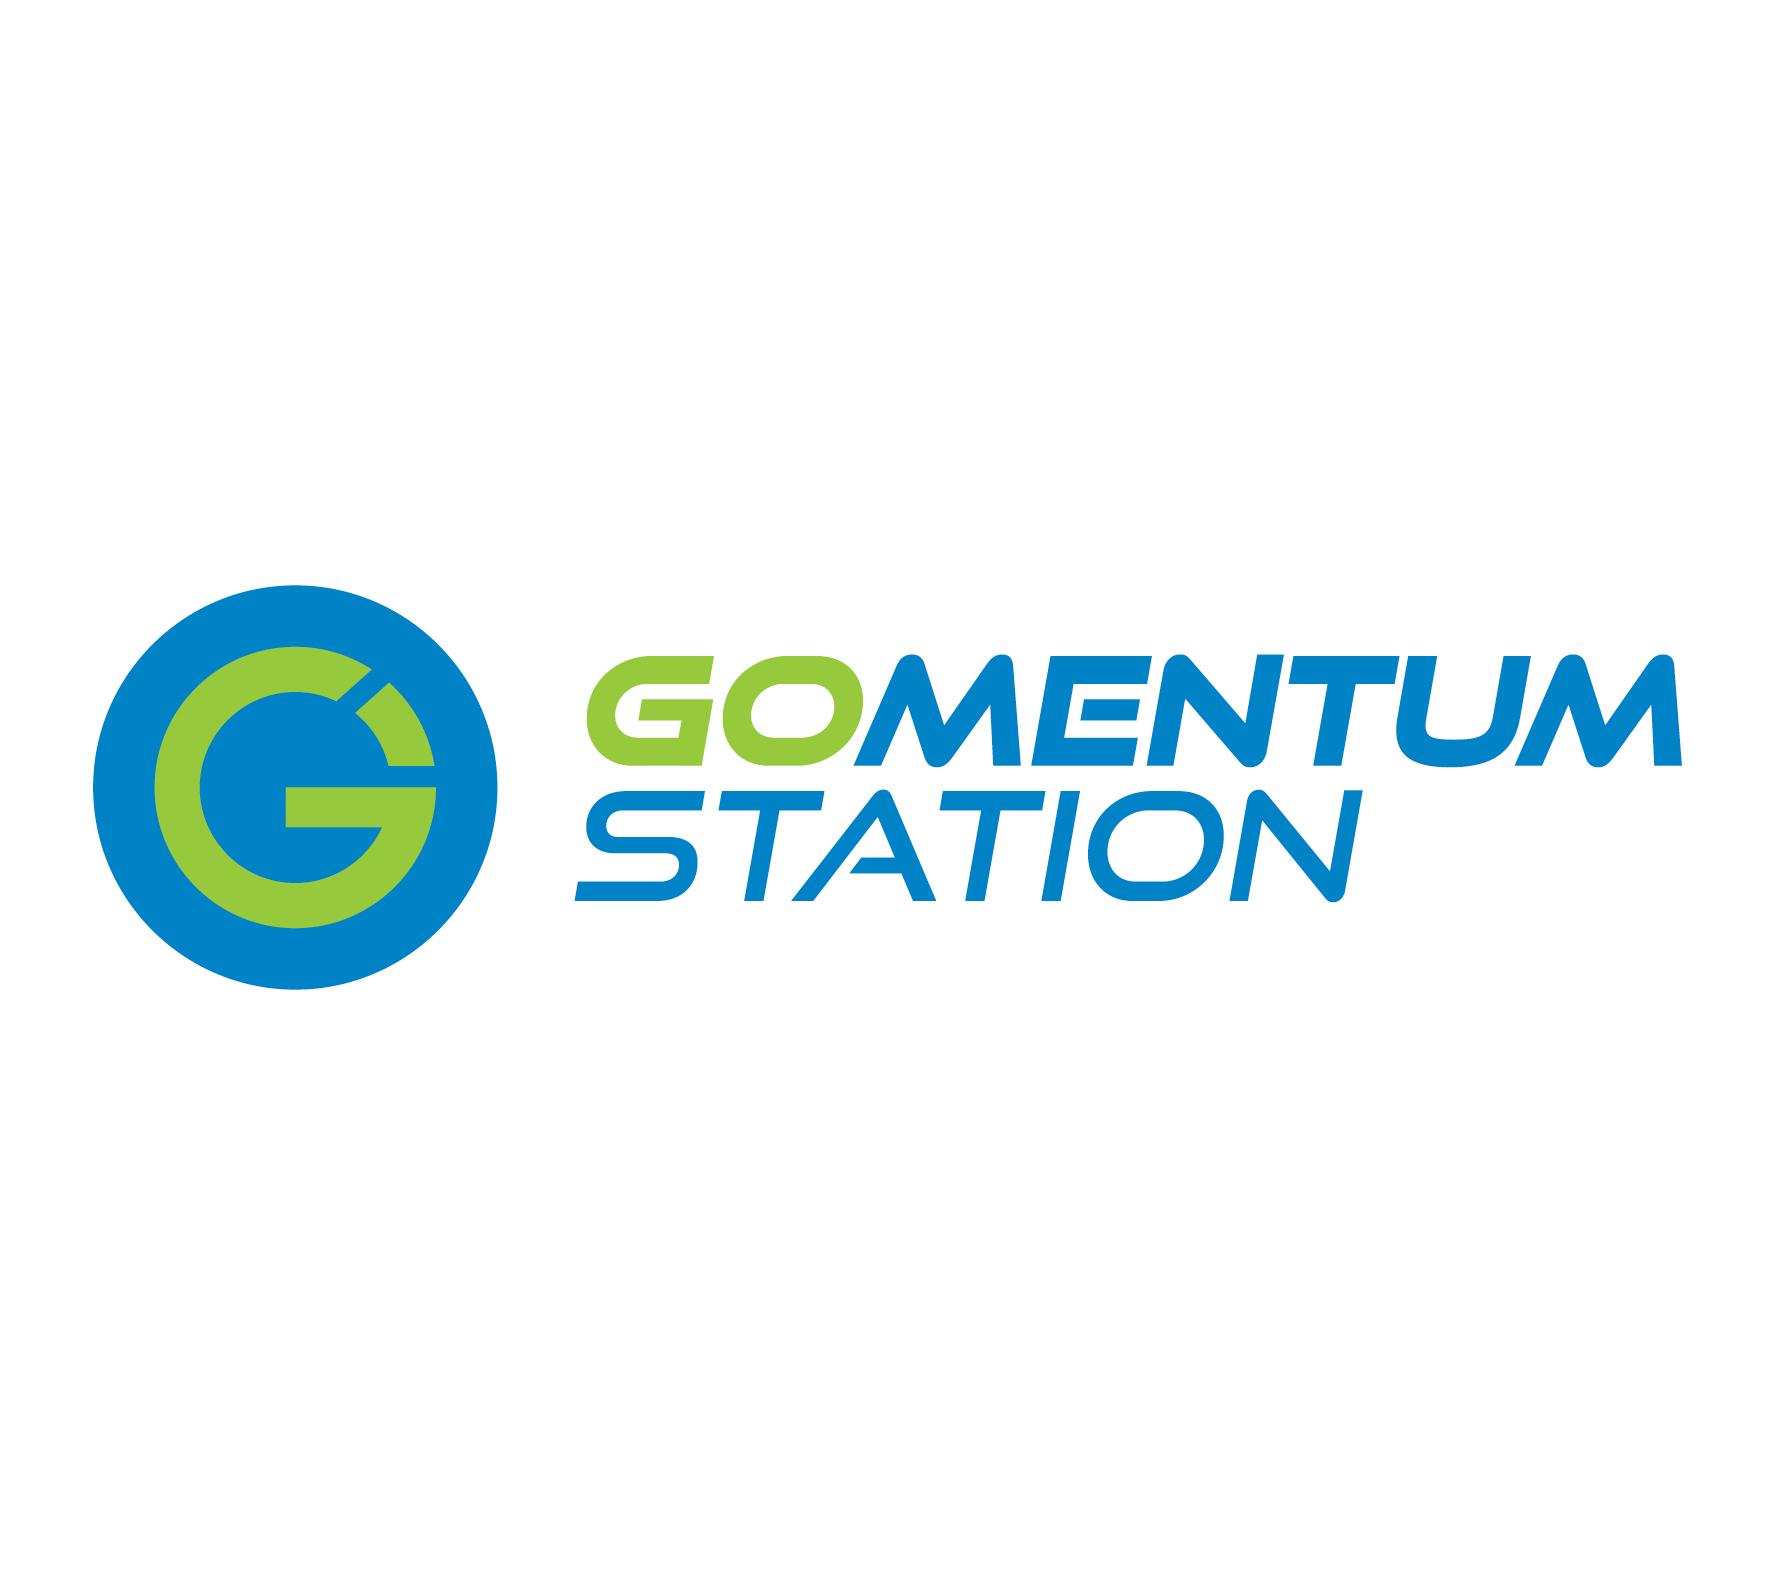 Gomentum Station